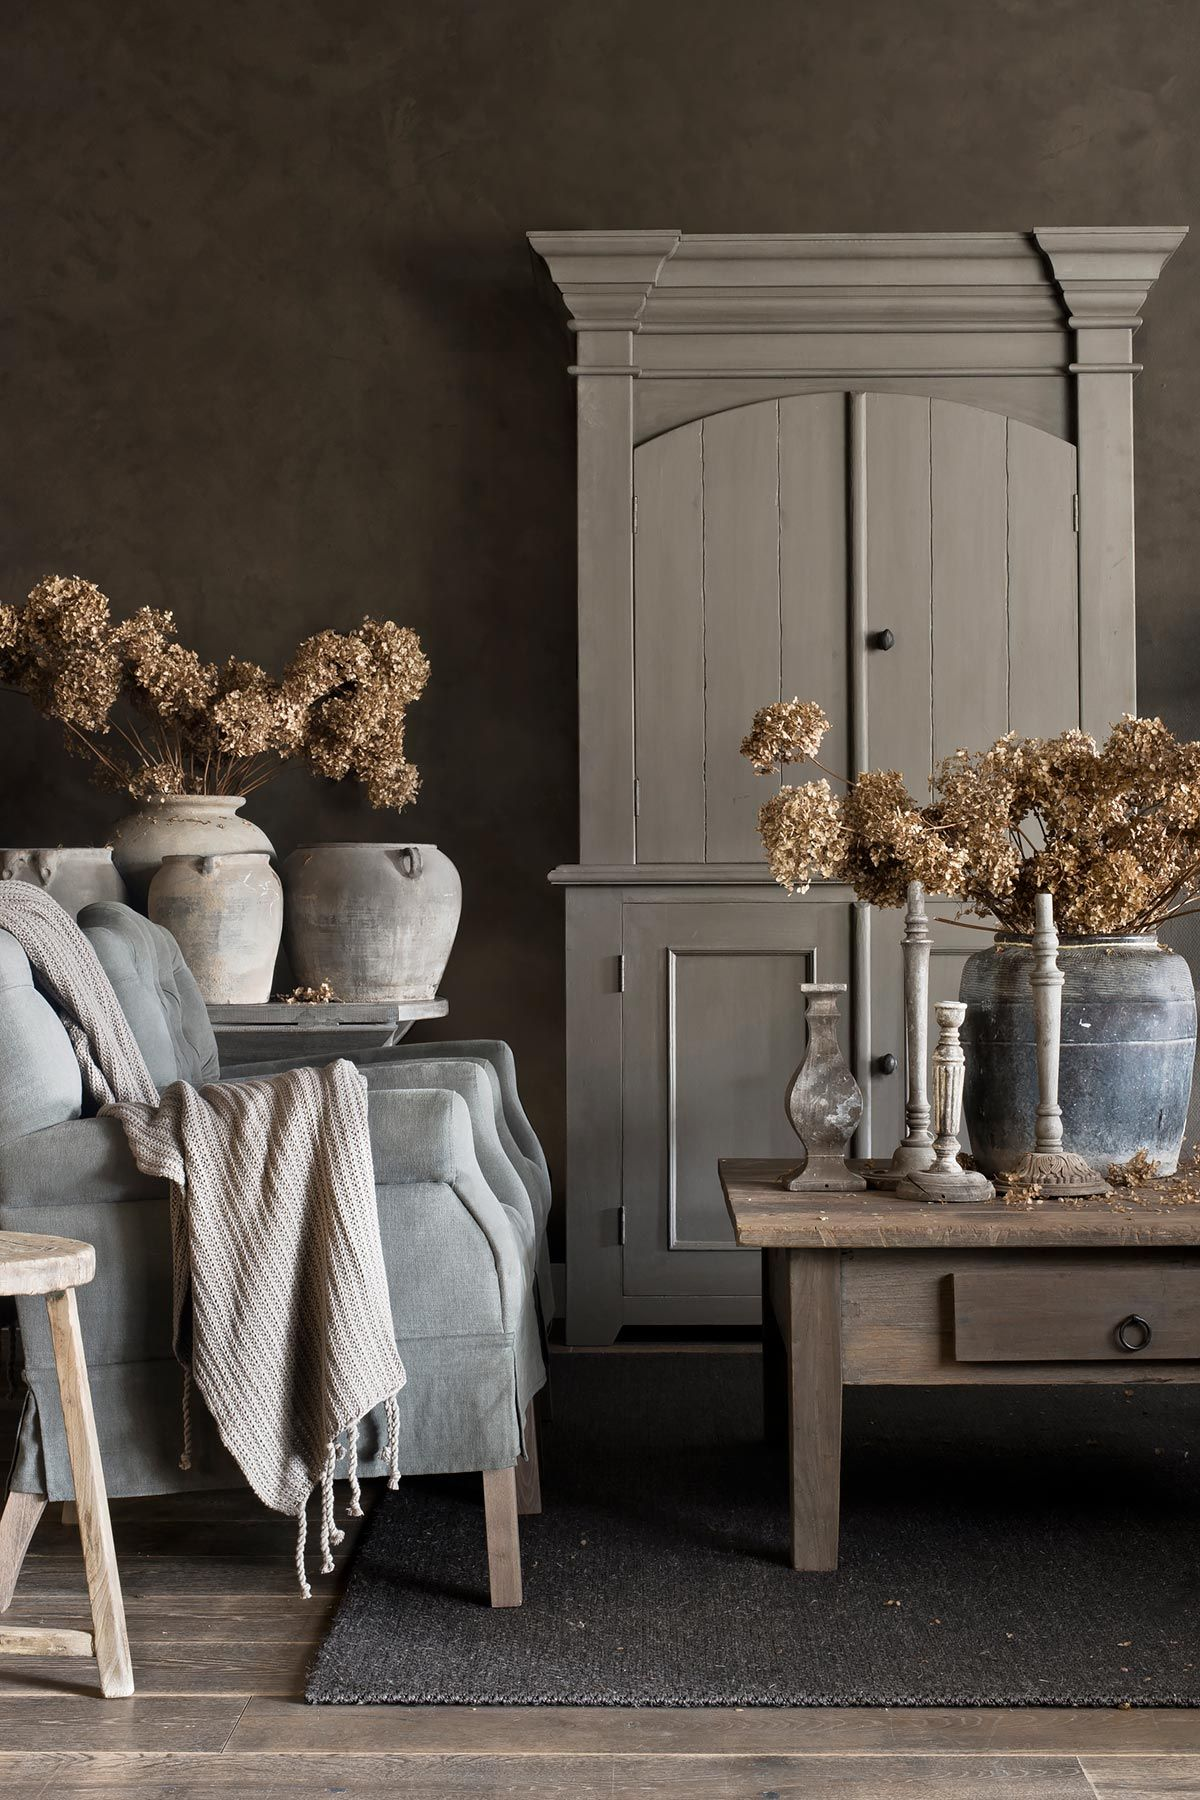 hoffz interieur hoffz kast capiton fauteuil landelijke woonaccessoires aksesuari. Black Bedroom Furniture Sets. Home Design Ideas